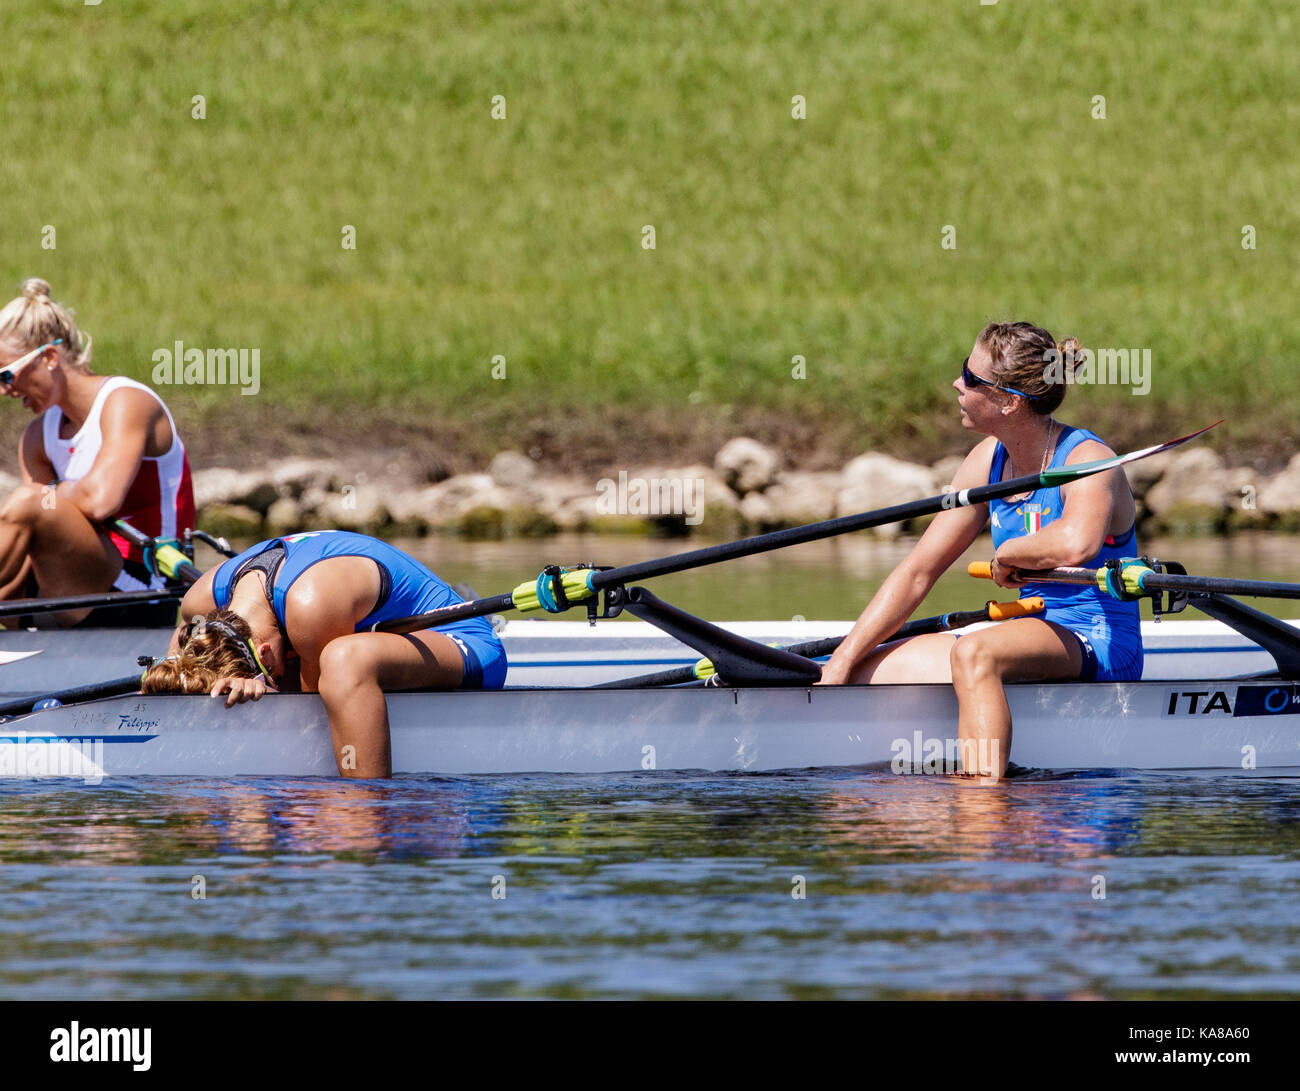 Sarasota-Bradenton, Florida, USA. 25th Sep, 2017. Kiri Tontodonati and Stefania Gobbi of team Italy during (W2x) Women's Double Sculls - Heat in the World Rowing Championships being held at Nathan Benderson Park in Sarasota-Bradenton, Florida. Del Mecum/CSM/Alamy Live News Stock Photo